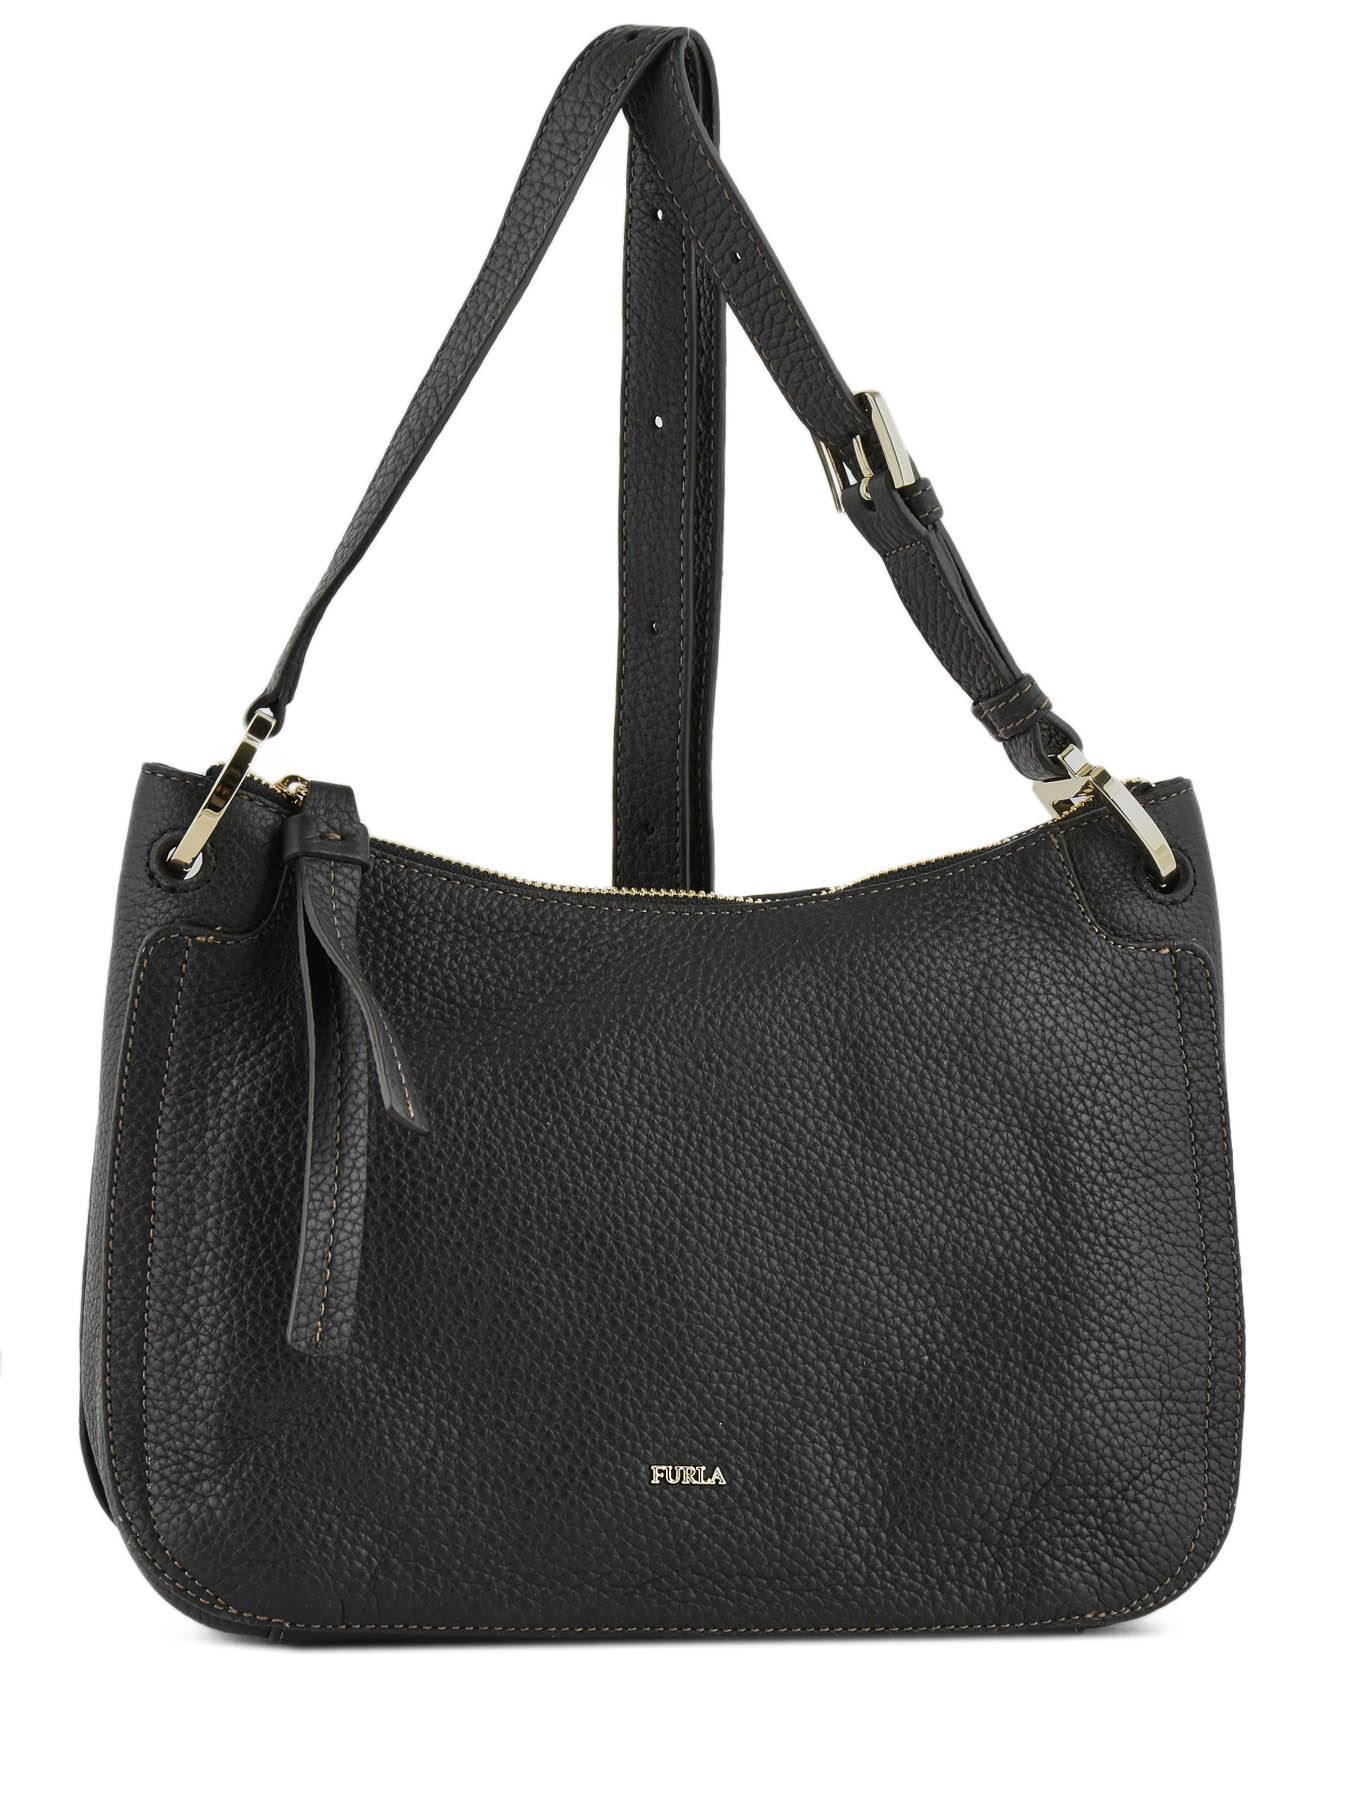 27798830b729b ... Shoulder Bag Rialto Leather Furla Black rialto RIA-BQV9 ...